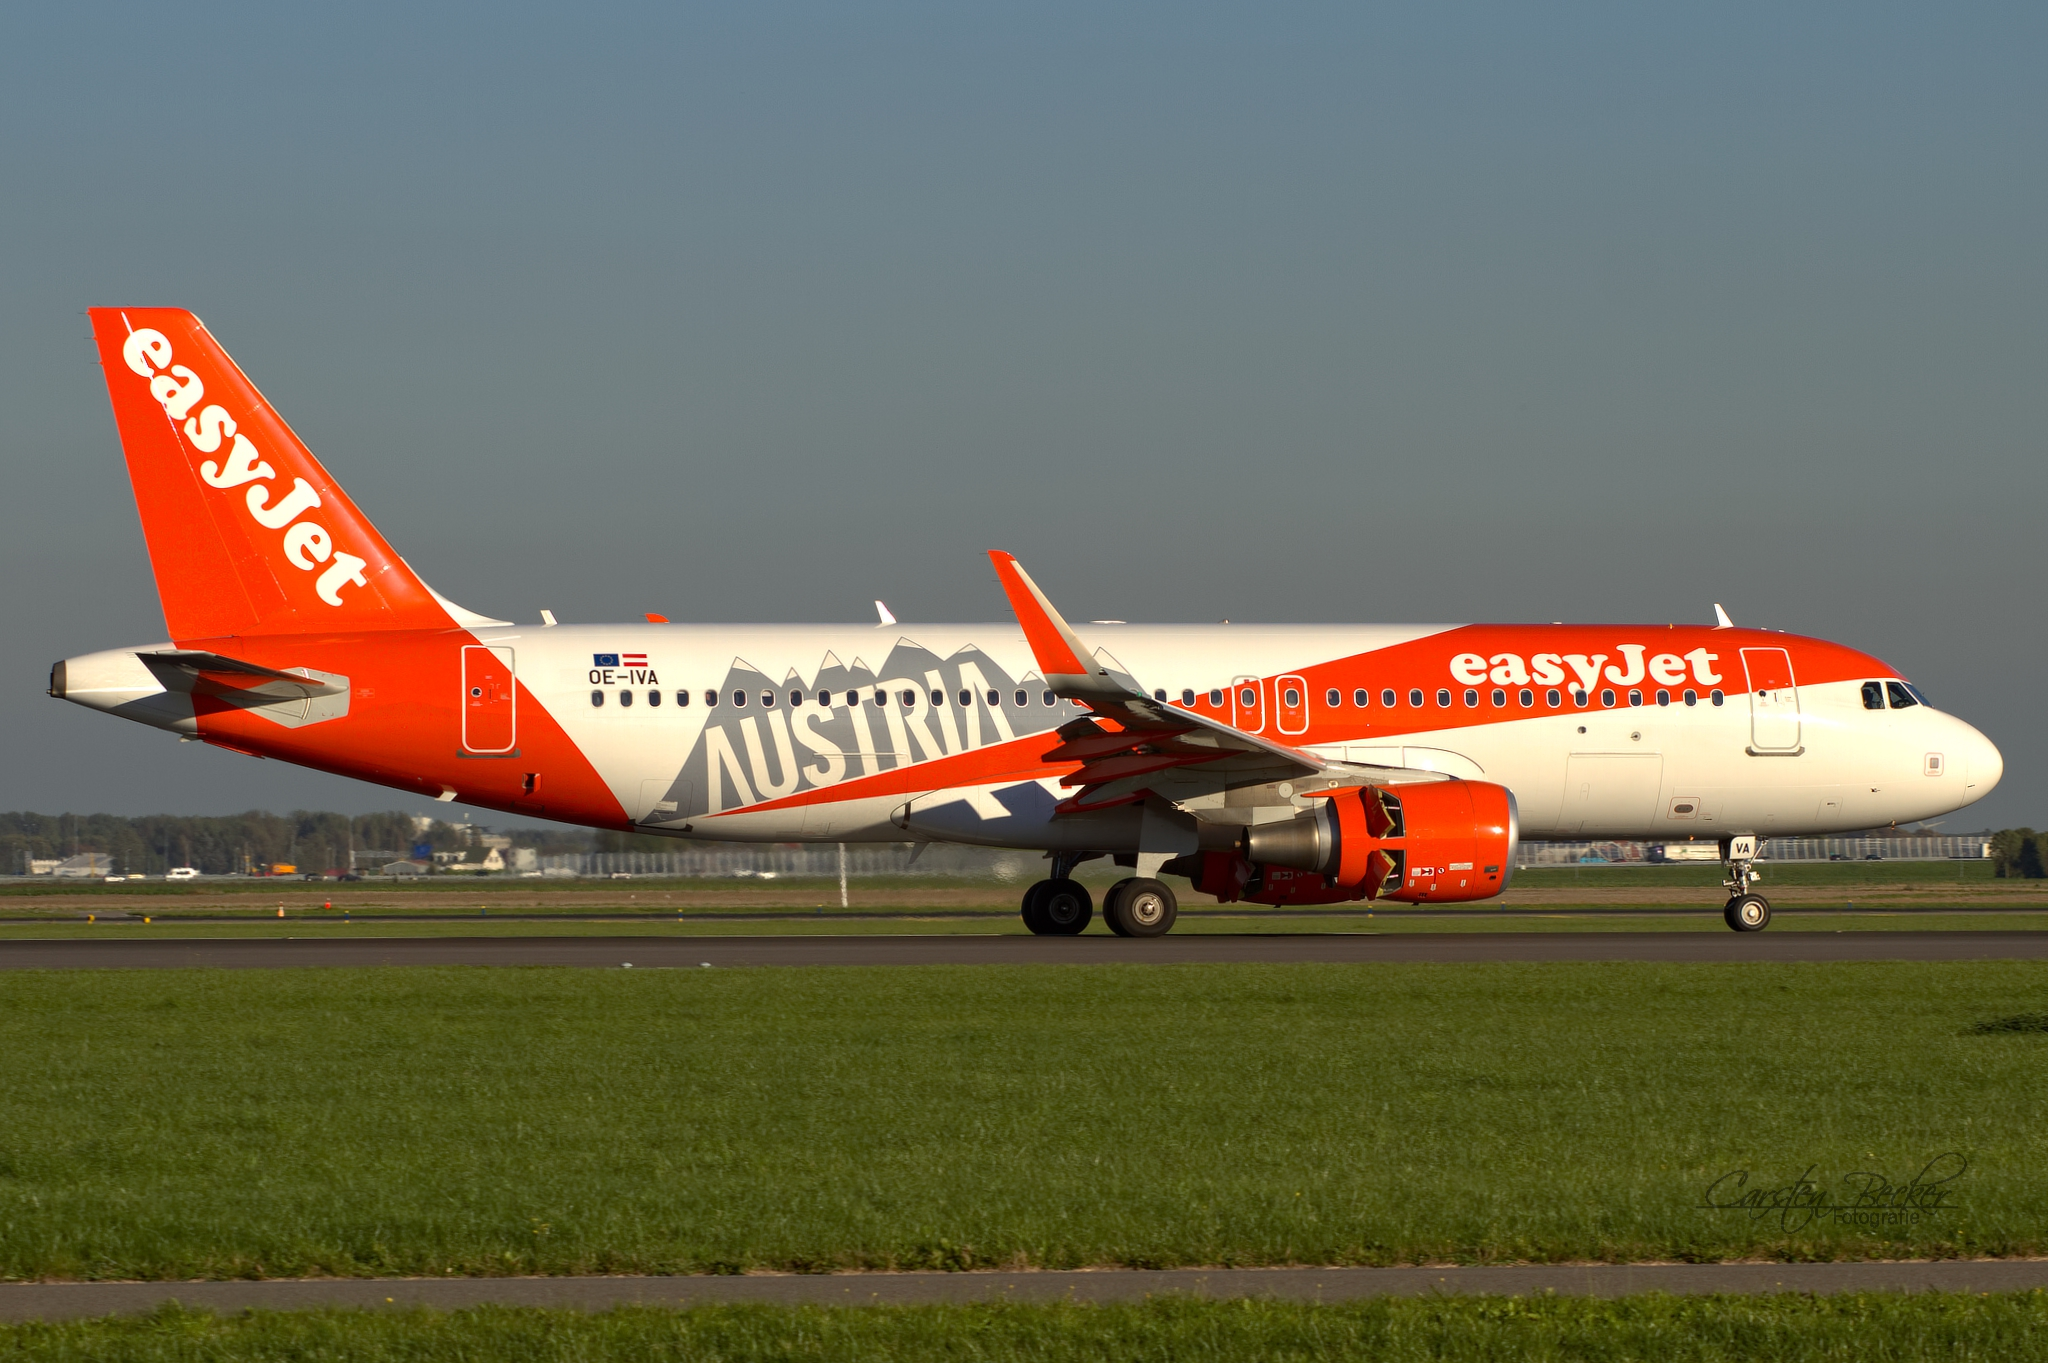 Easy Jet A320 OE-IVA Visit Austria